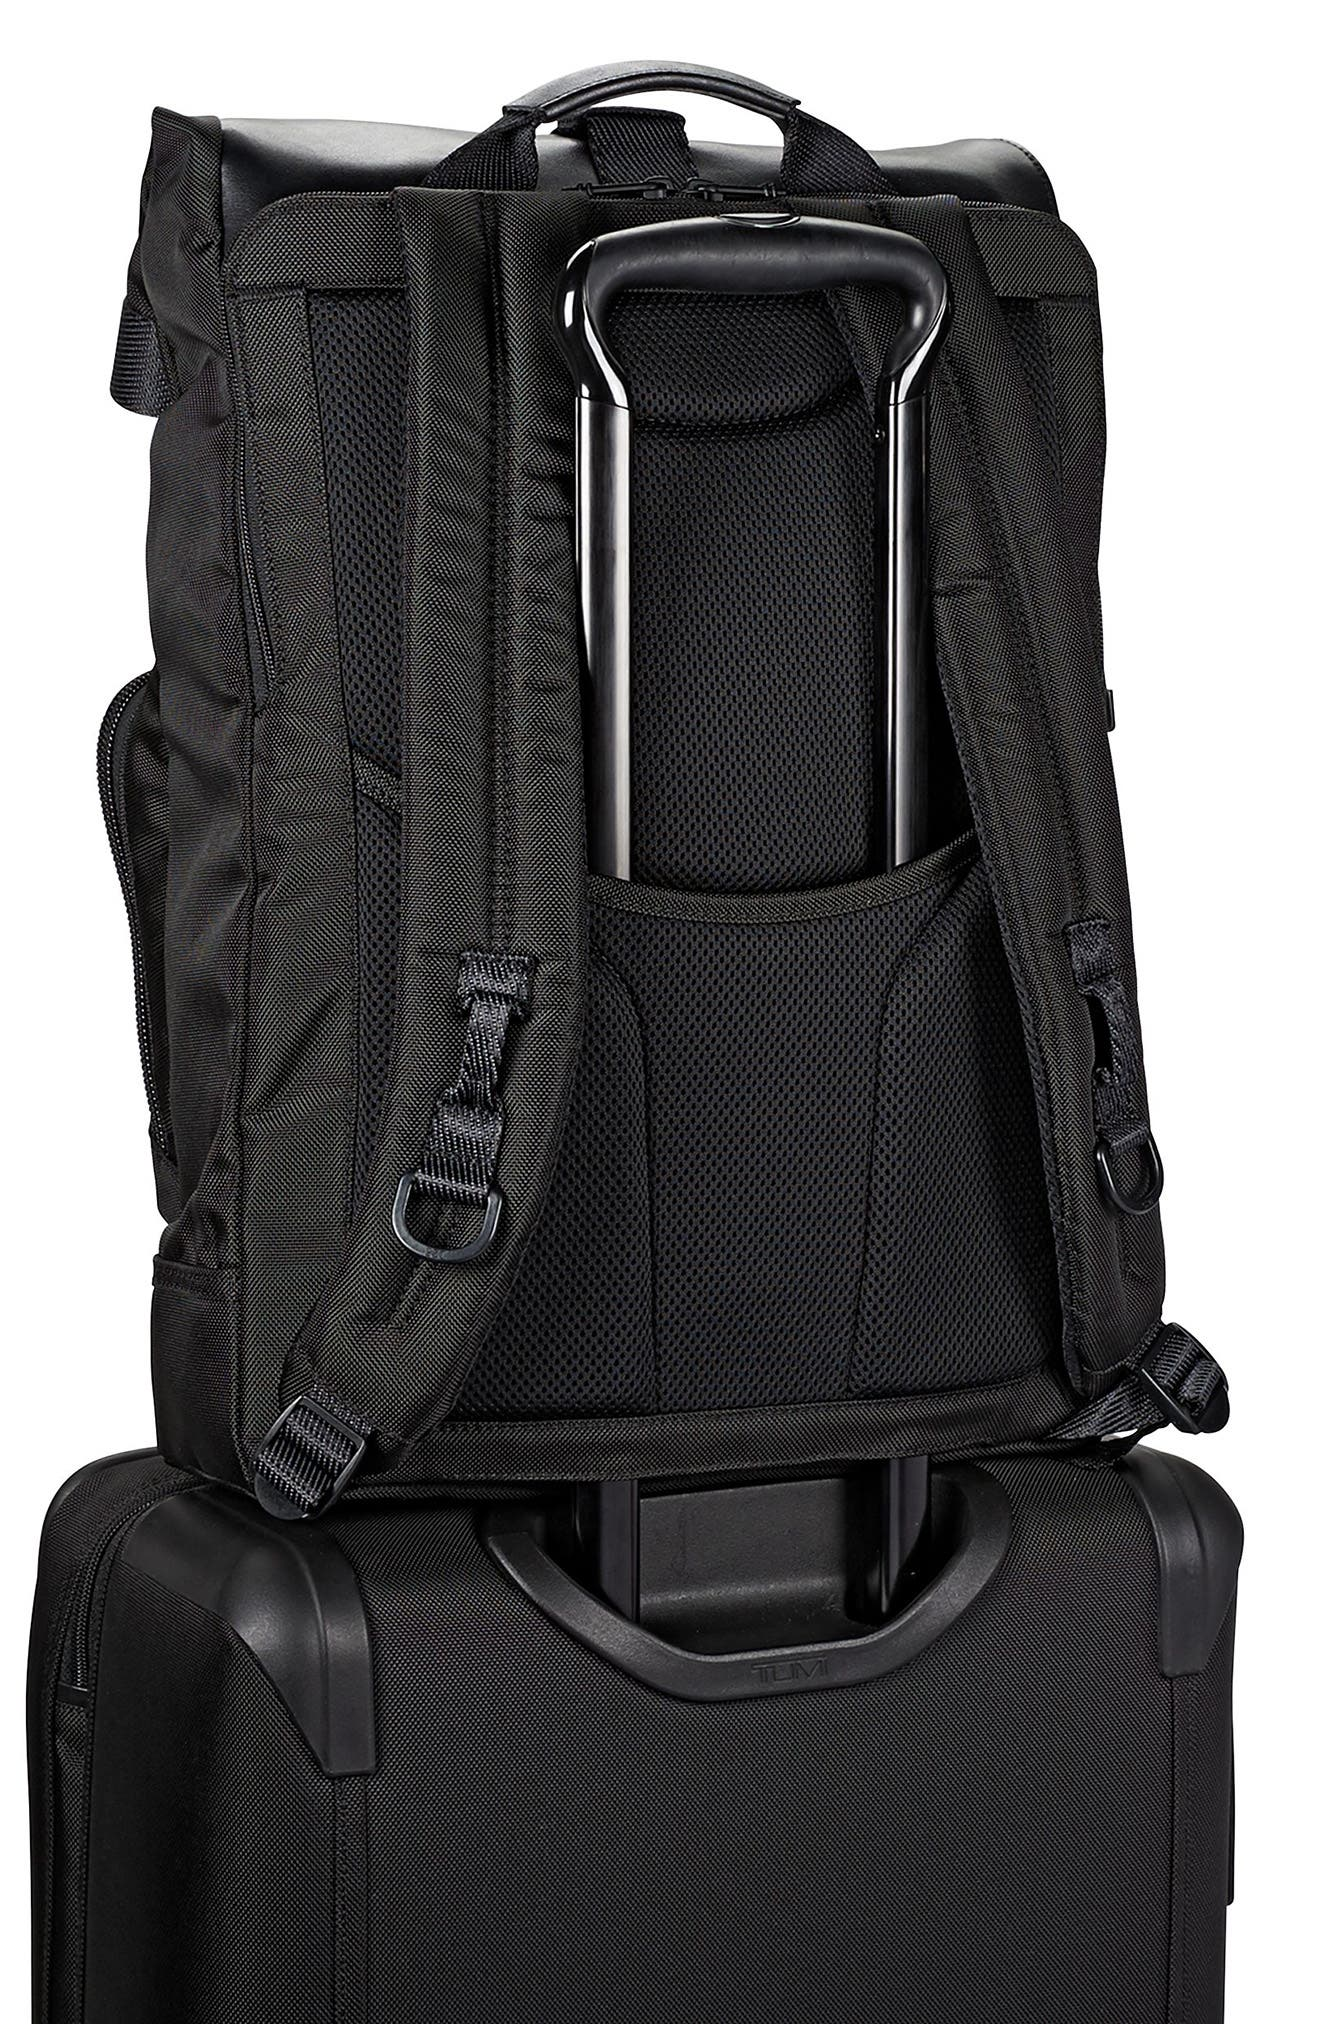 Alpha Bravo - London Backpack,                             Alternate thumbnail 2, color,                             BLACK